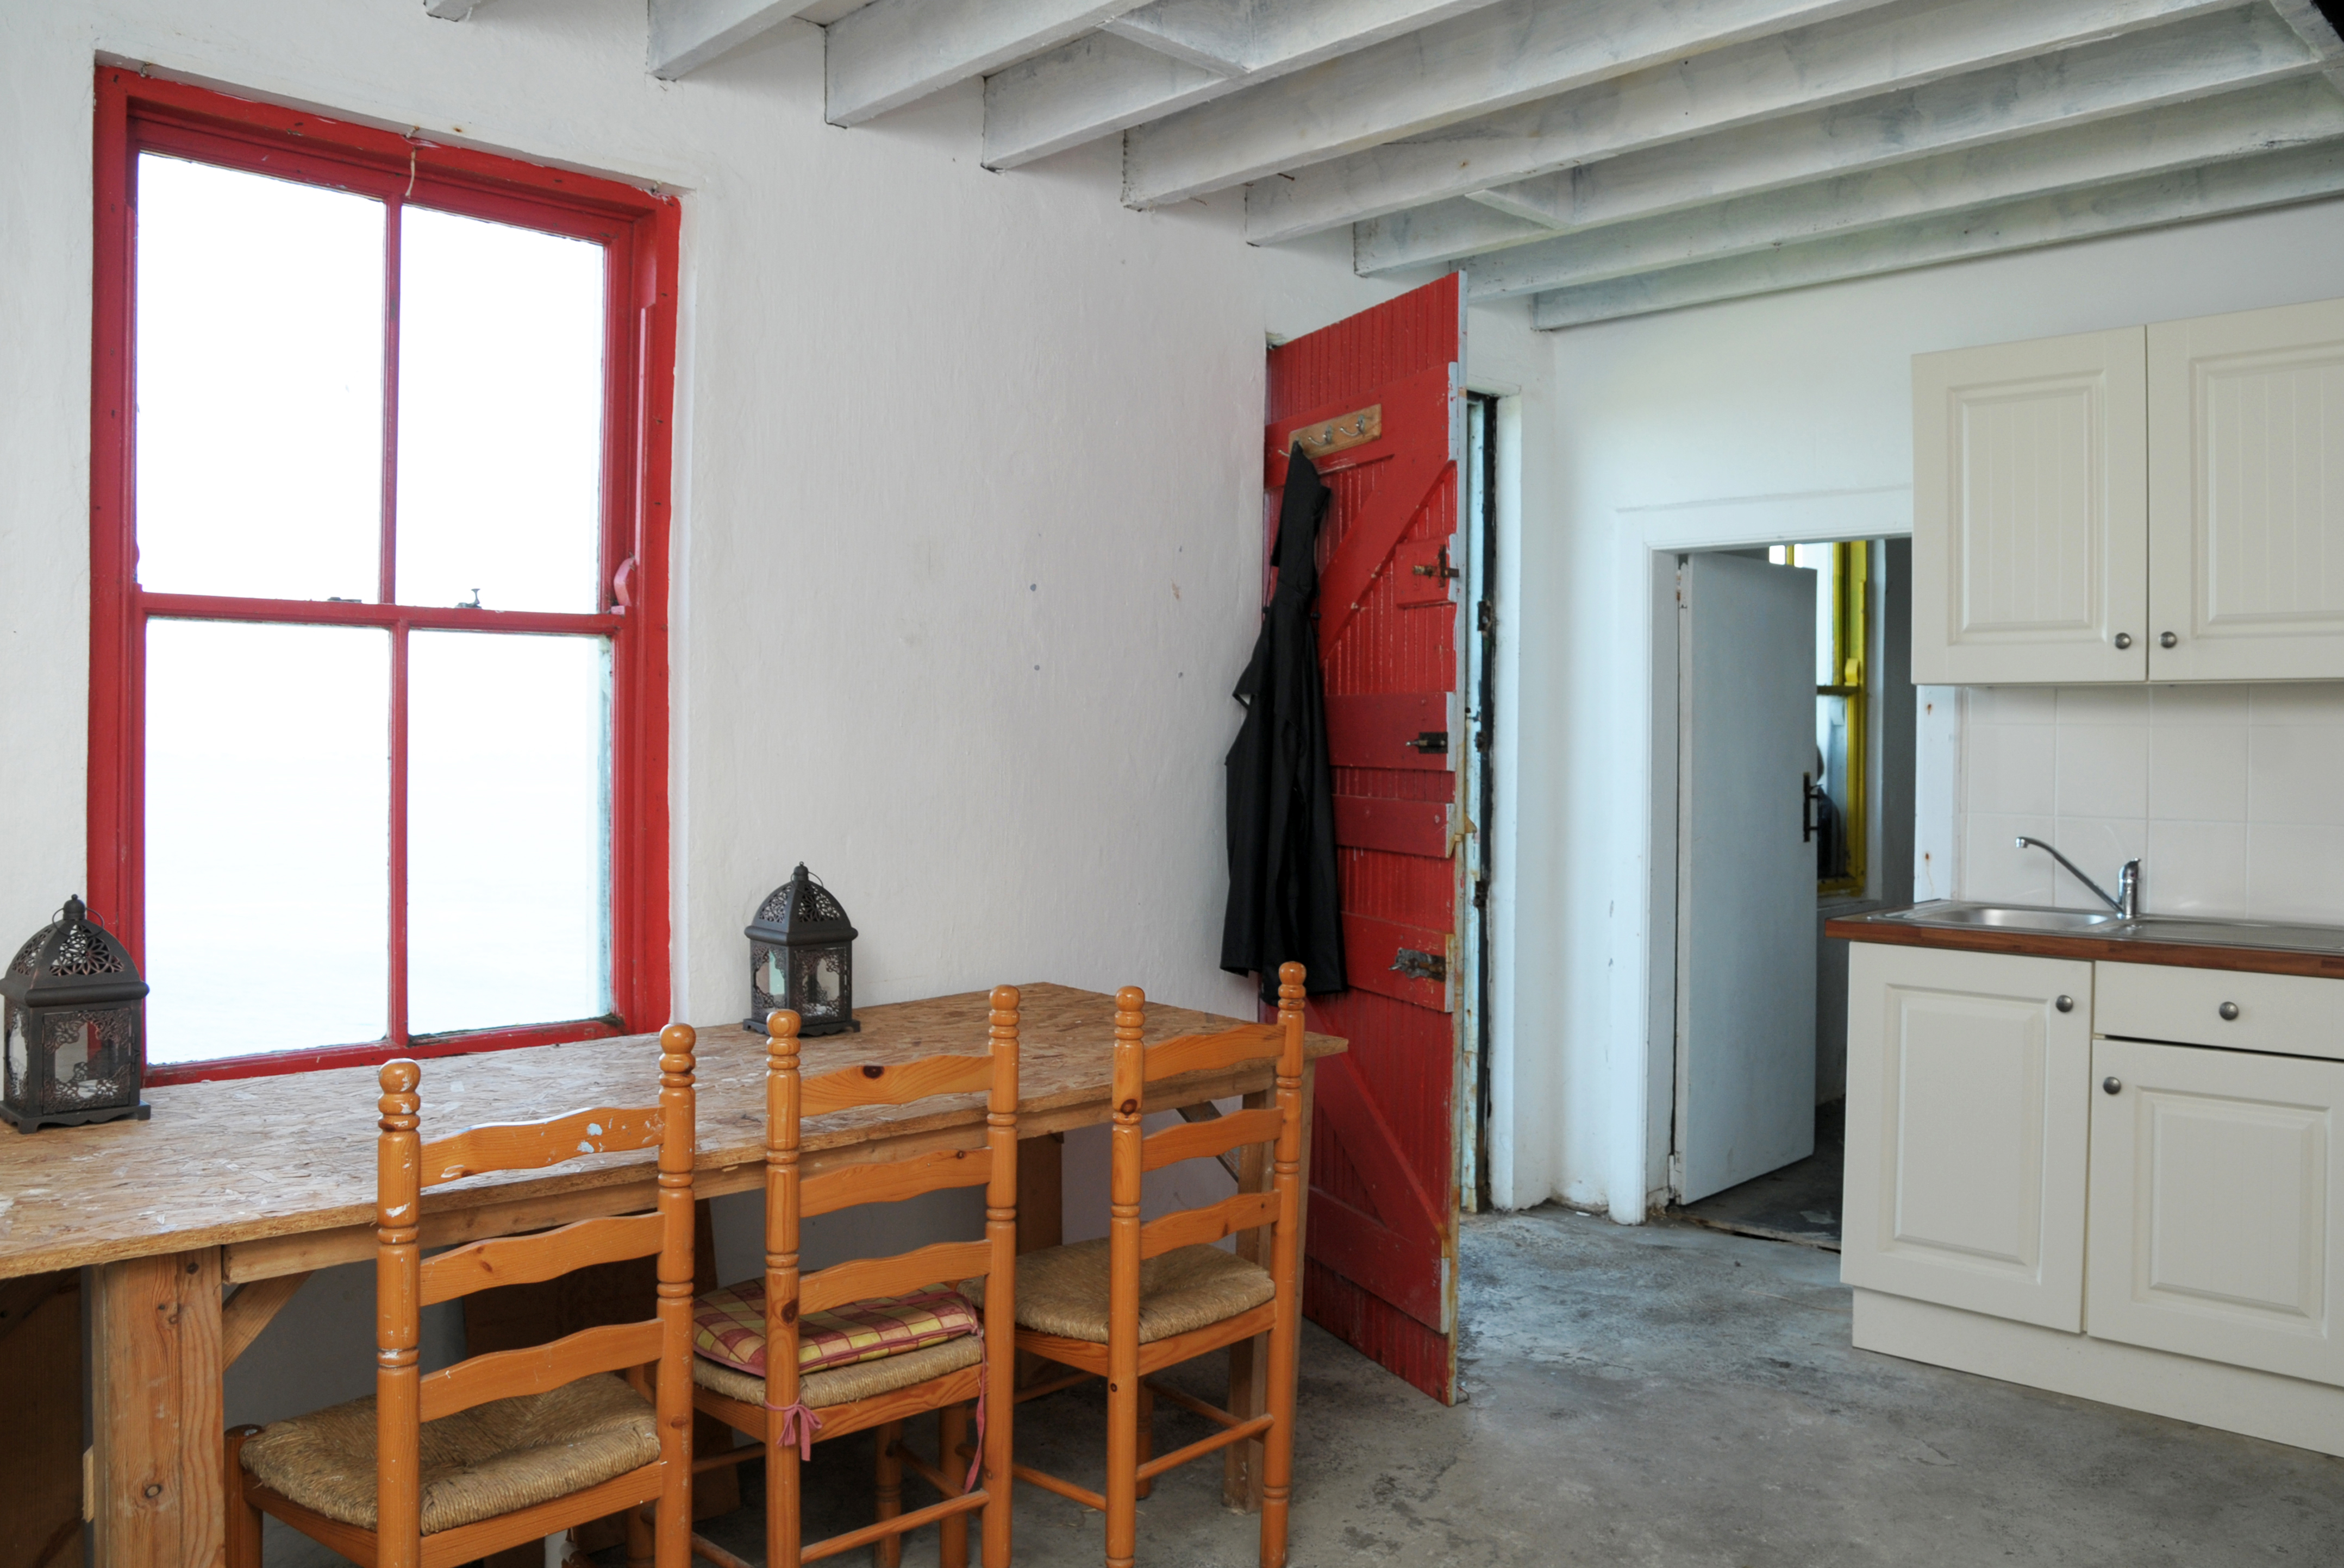 File:Accommodation on the Blasket Island.jpg - Wikimedia Commons